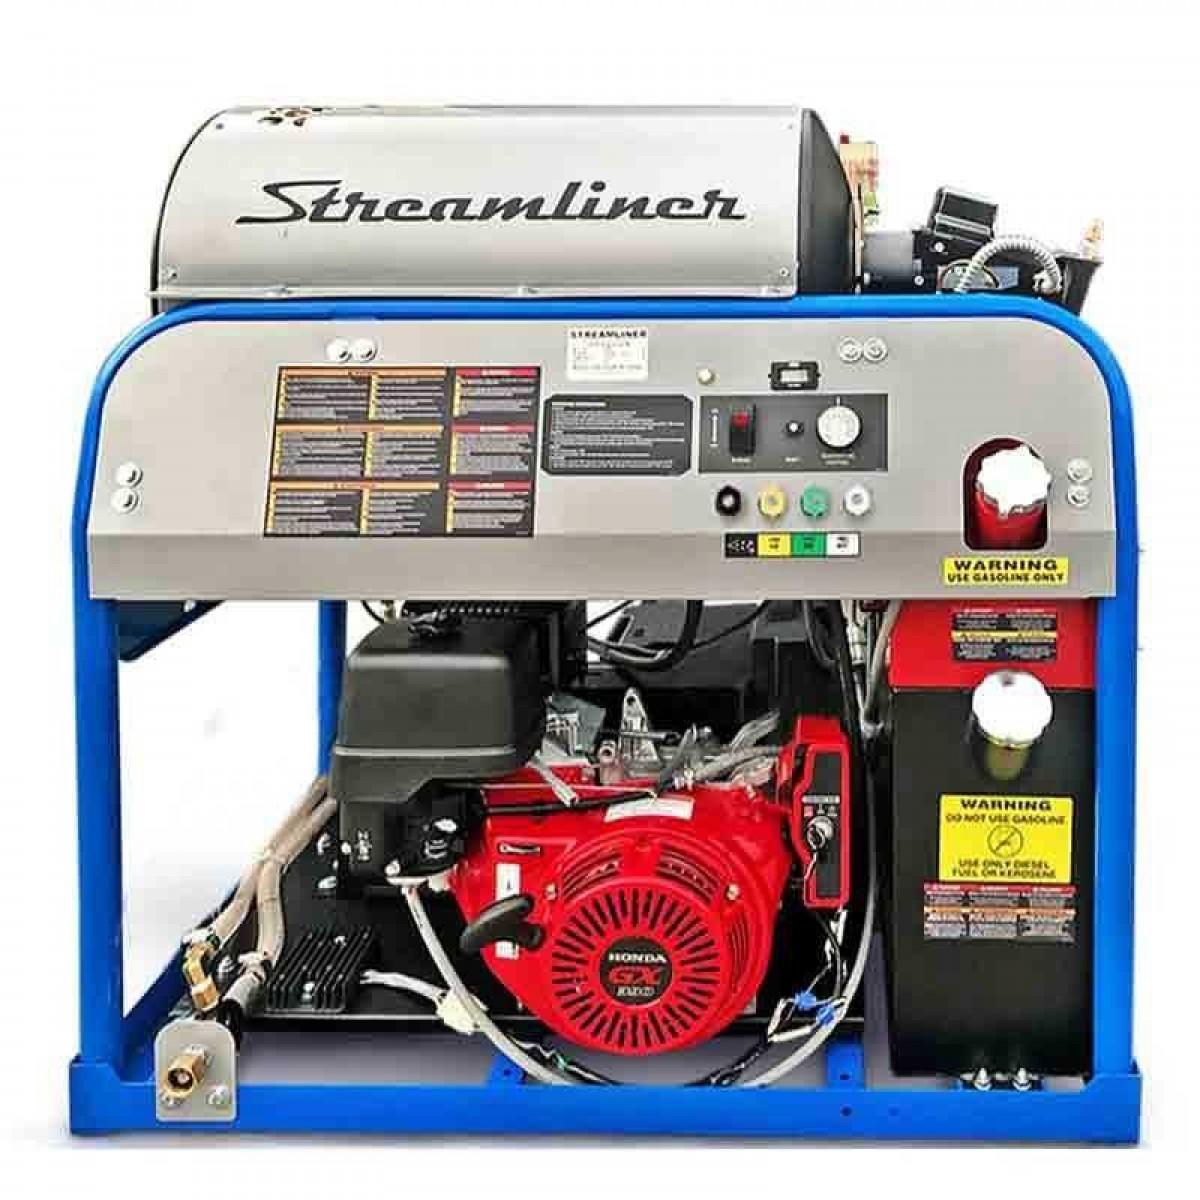 Delco Streamliner 65005 4000 Psi Vanguard 570cc Gas Engine